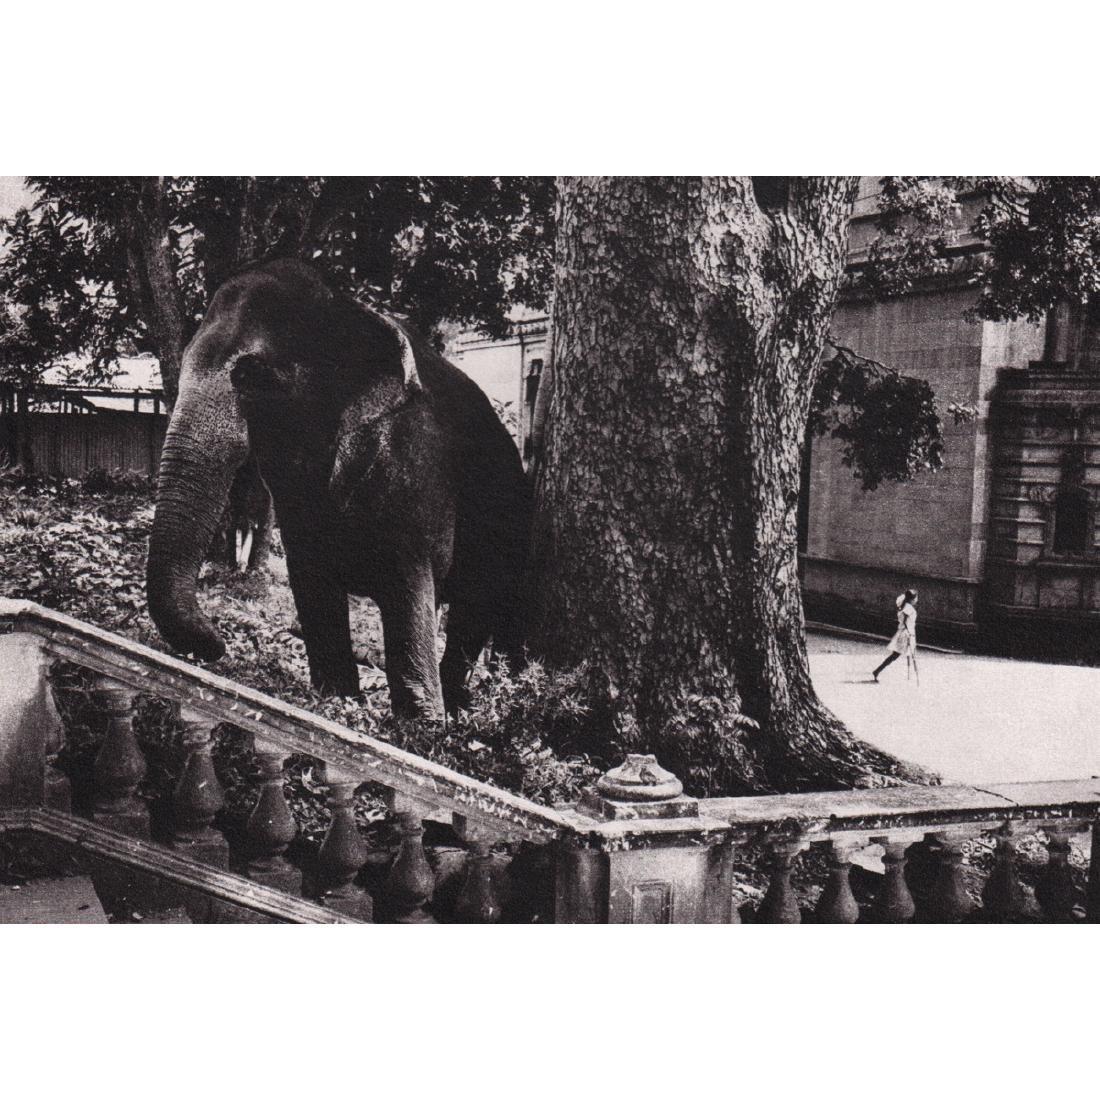 DJAN SEYLAN - Sri Lanka, 1975